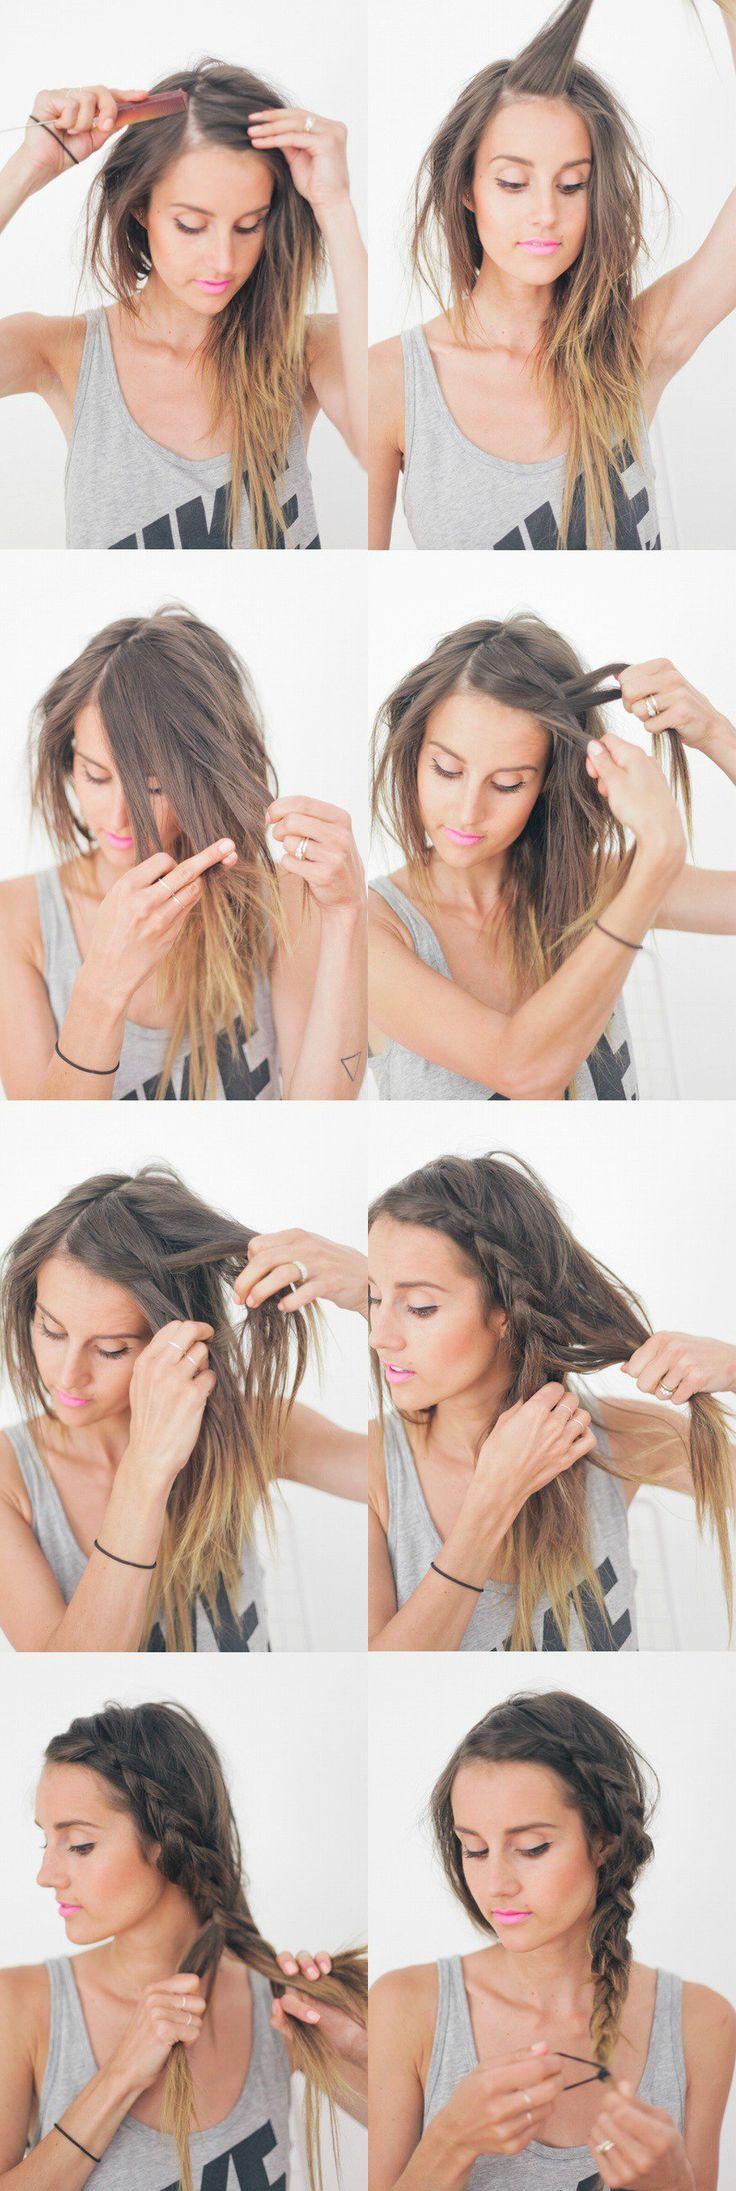 15 Step by Step Hair Tutorials For Bad Hair Days